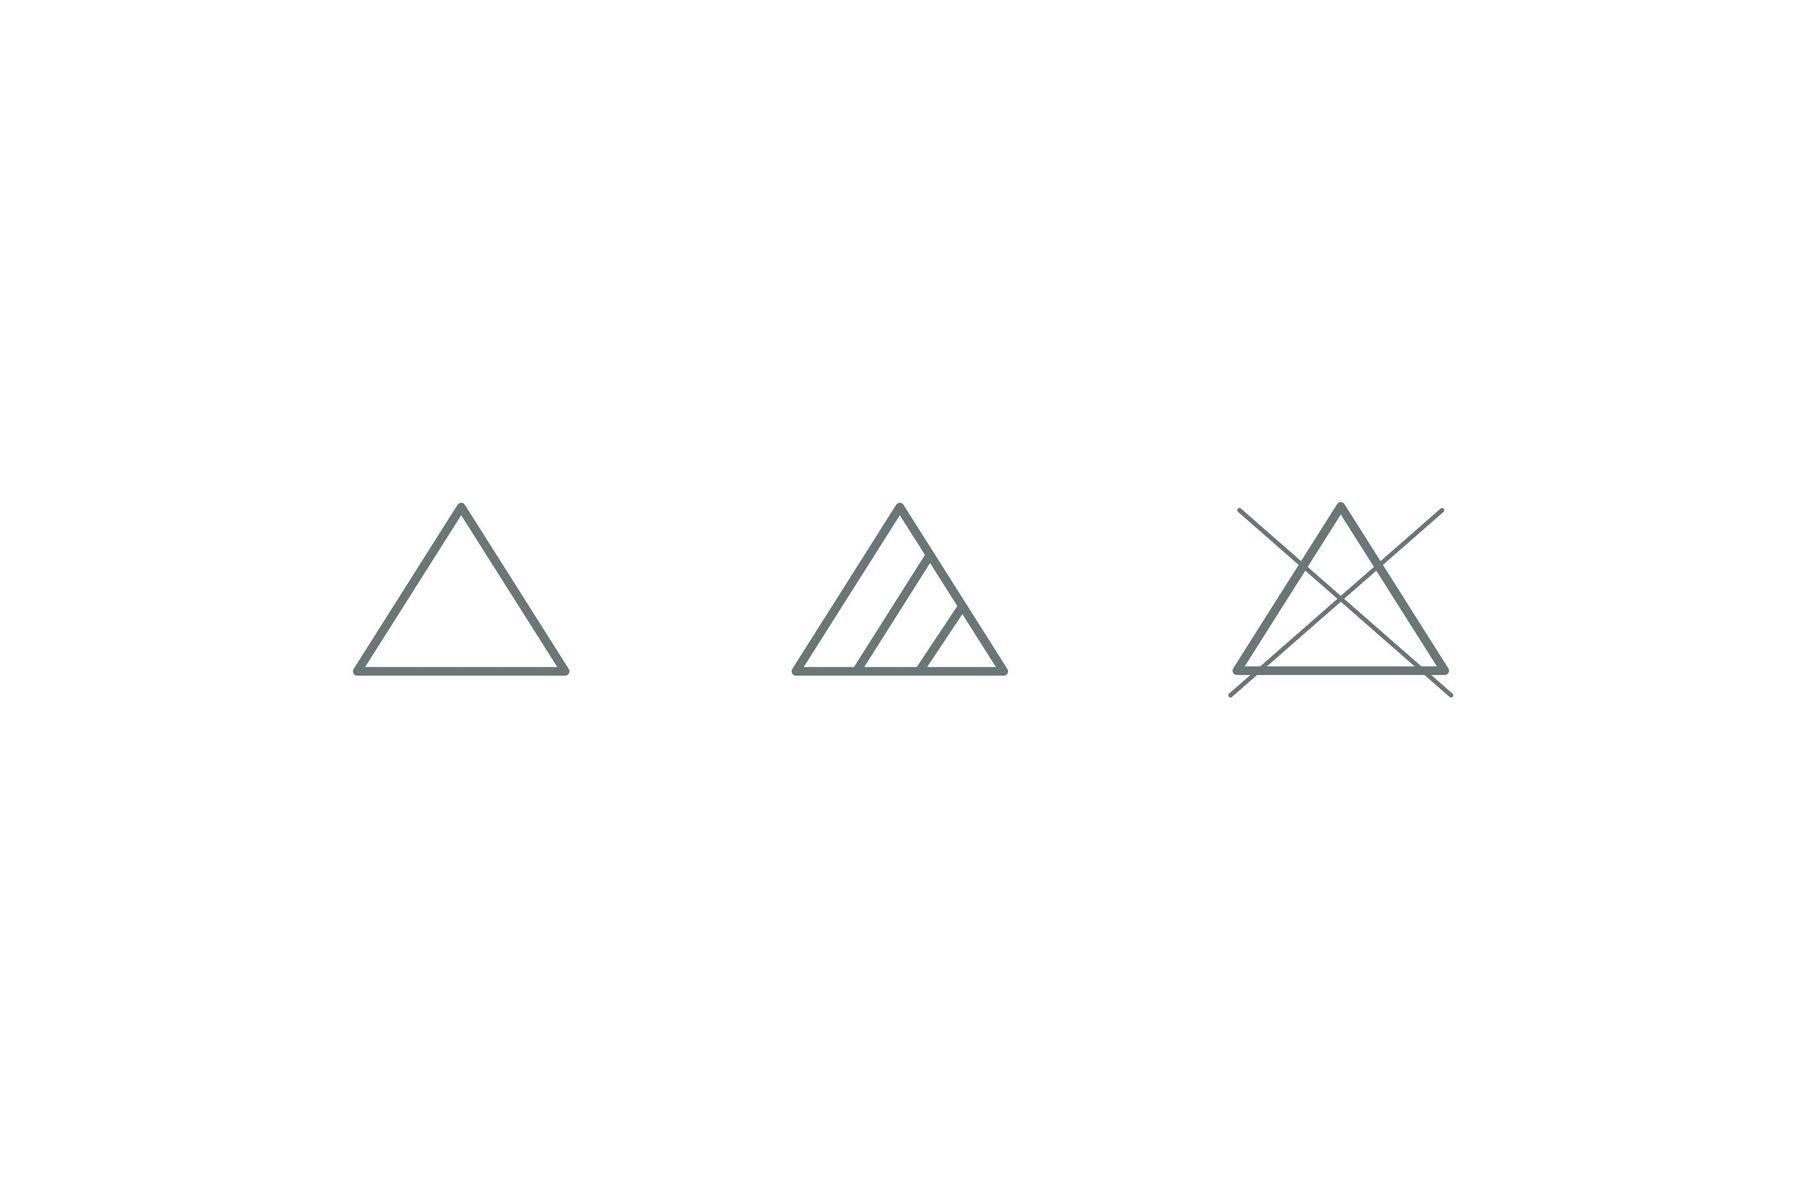 Bleaching symbols